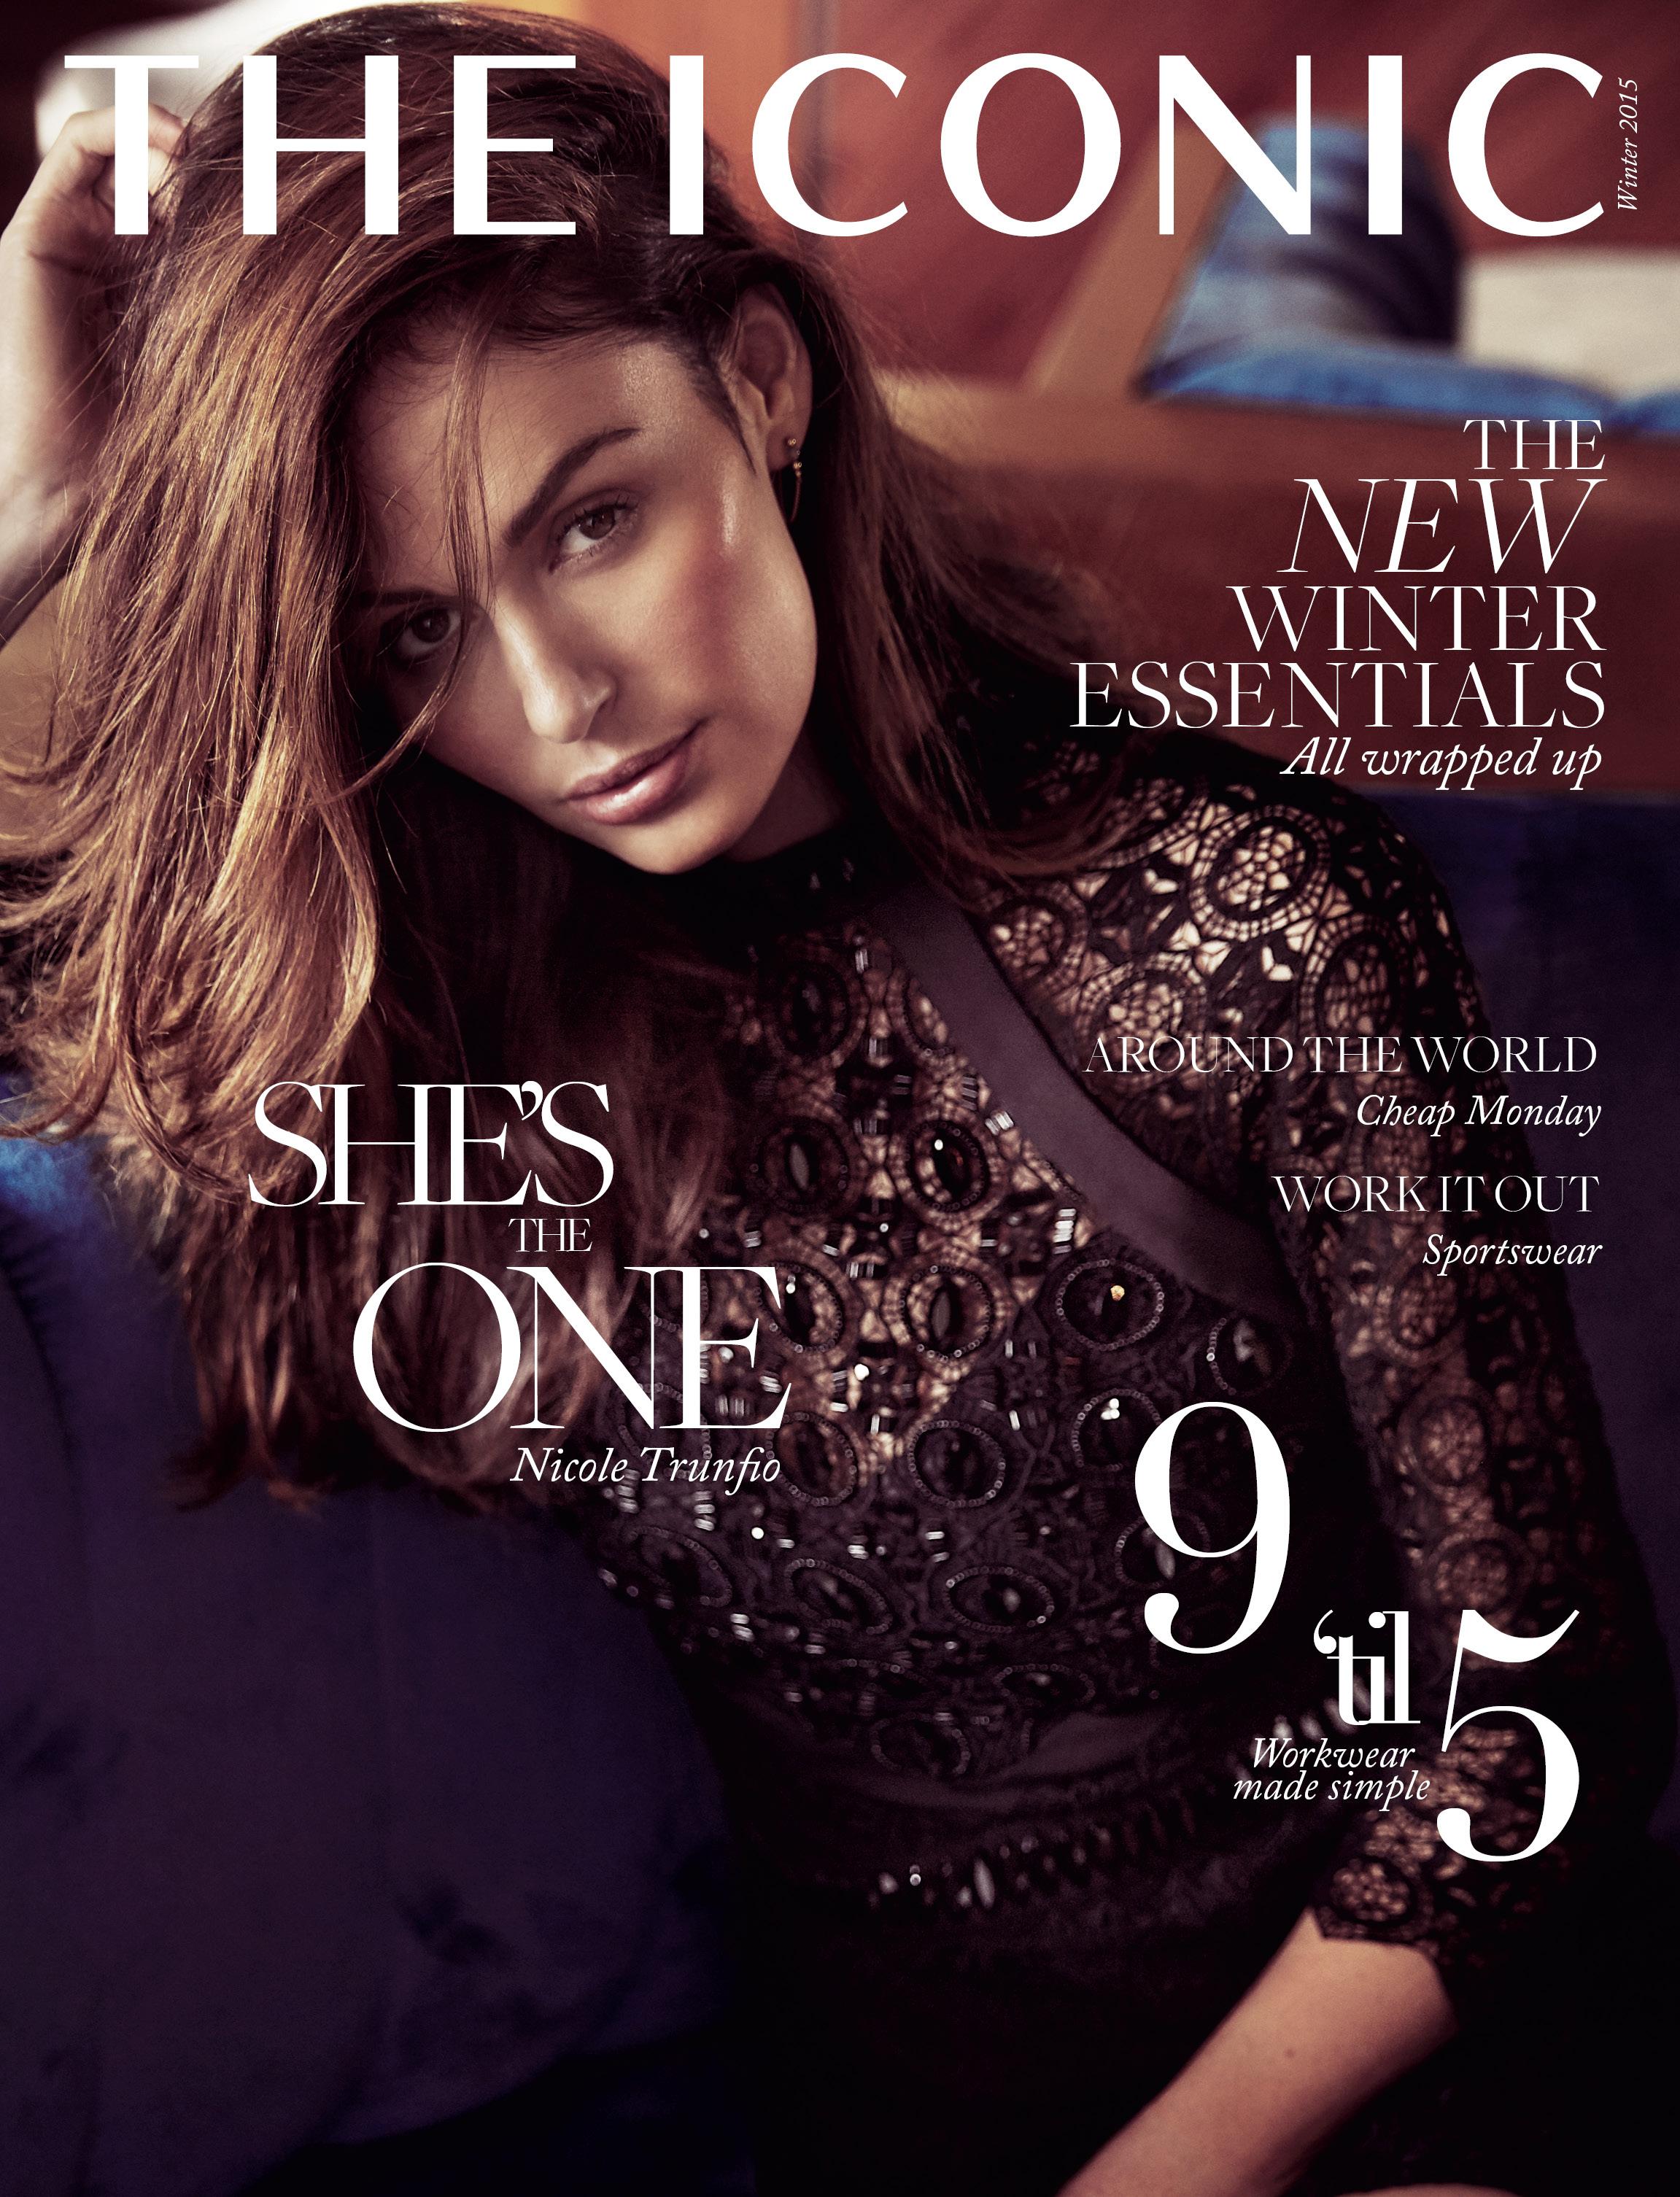 Online Fashion Retailer THE ICONIC Launches Magazine Featuring Supermodel  Nicole Trunfio - B&T